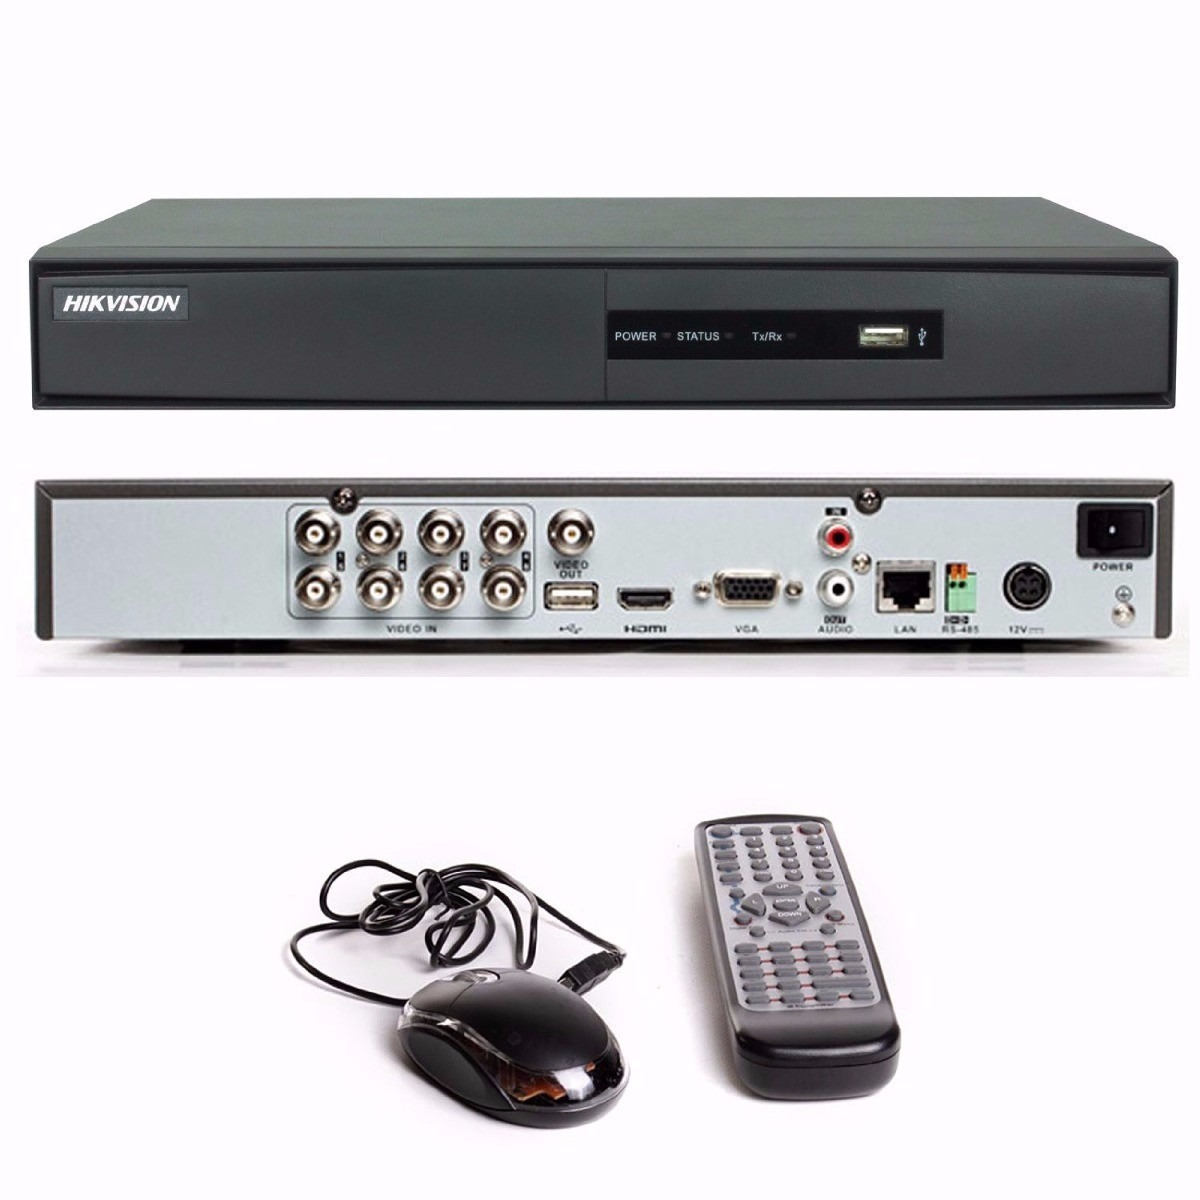 Dvr Hikvision 8 Ch. Turbo Hd 3.0 Pentaflex 5x1 Imagem Hd 720p